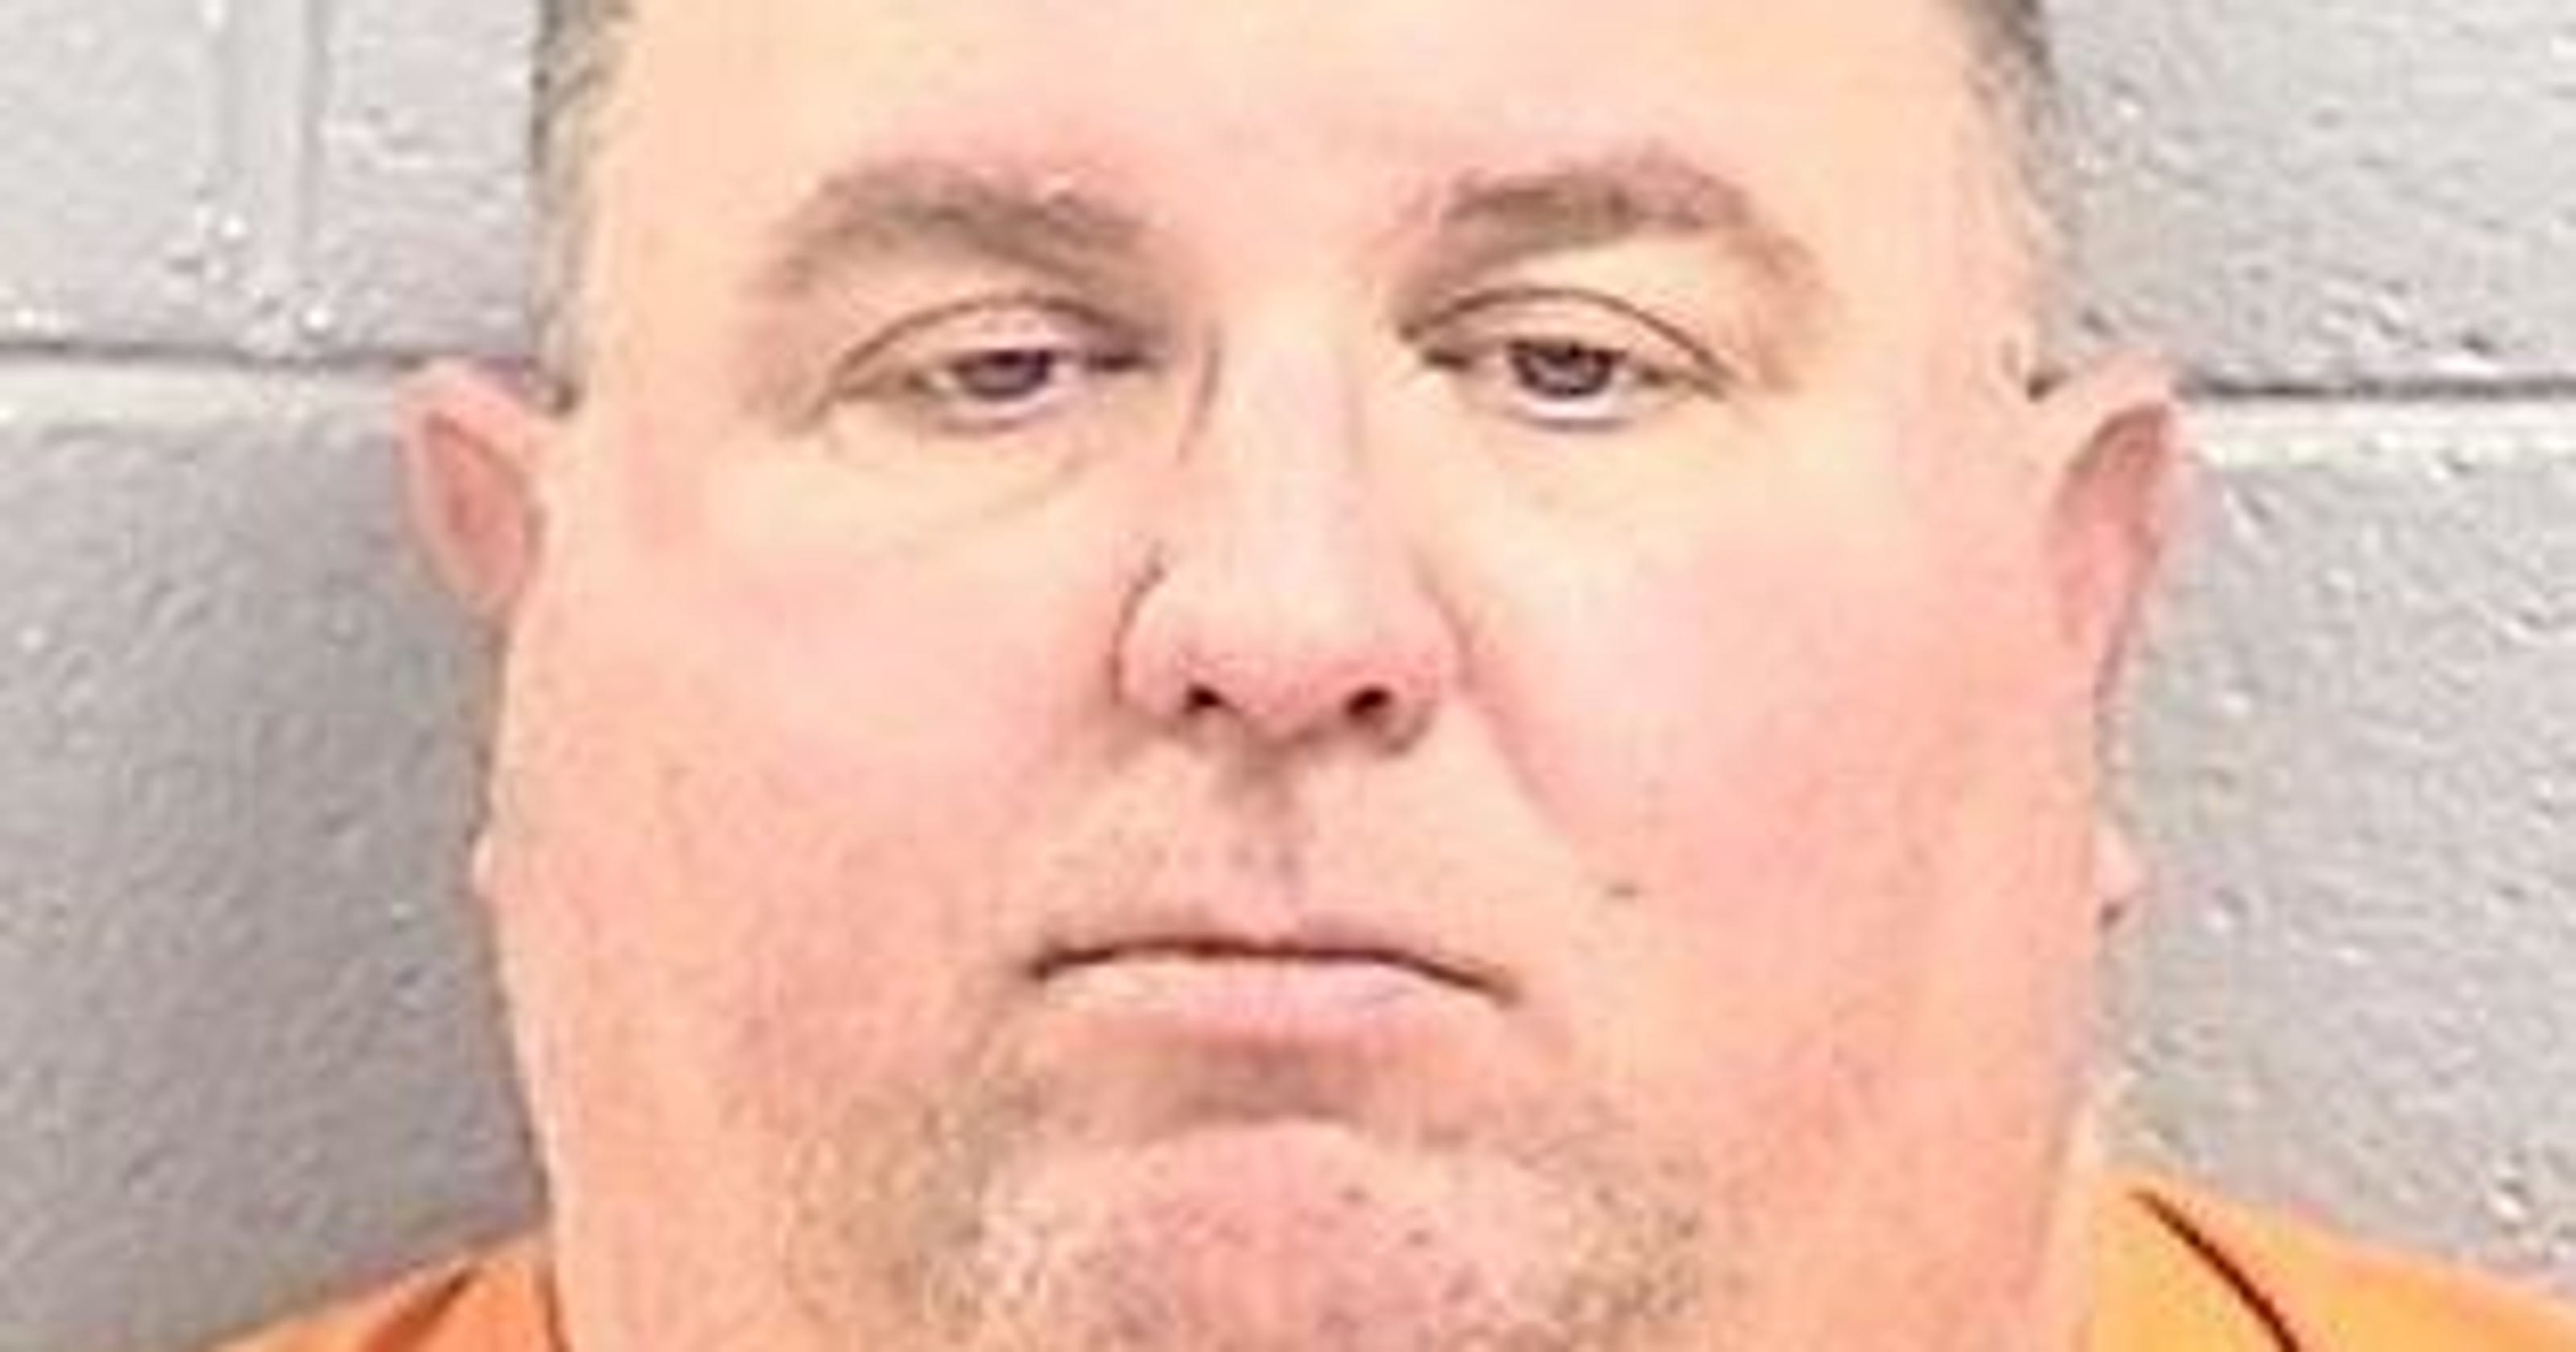 Former Lowe's employee accused of stealing $33,000